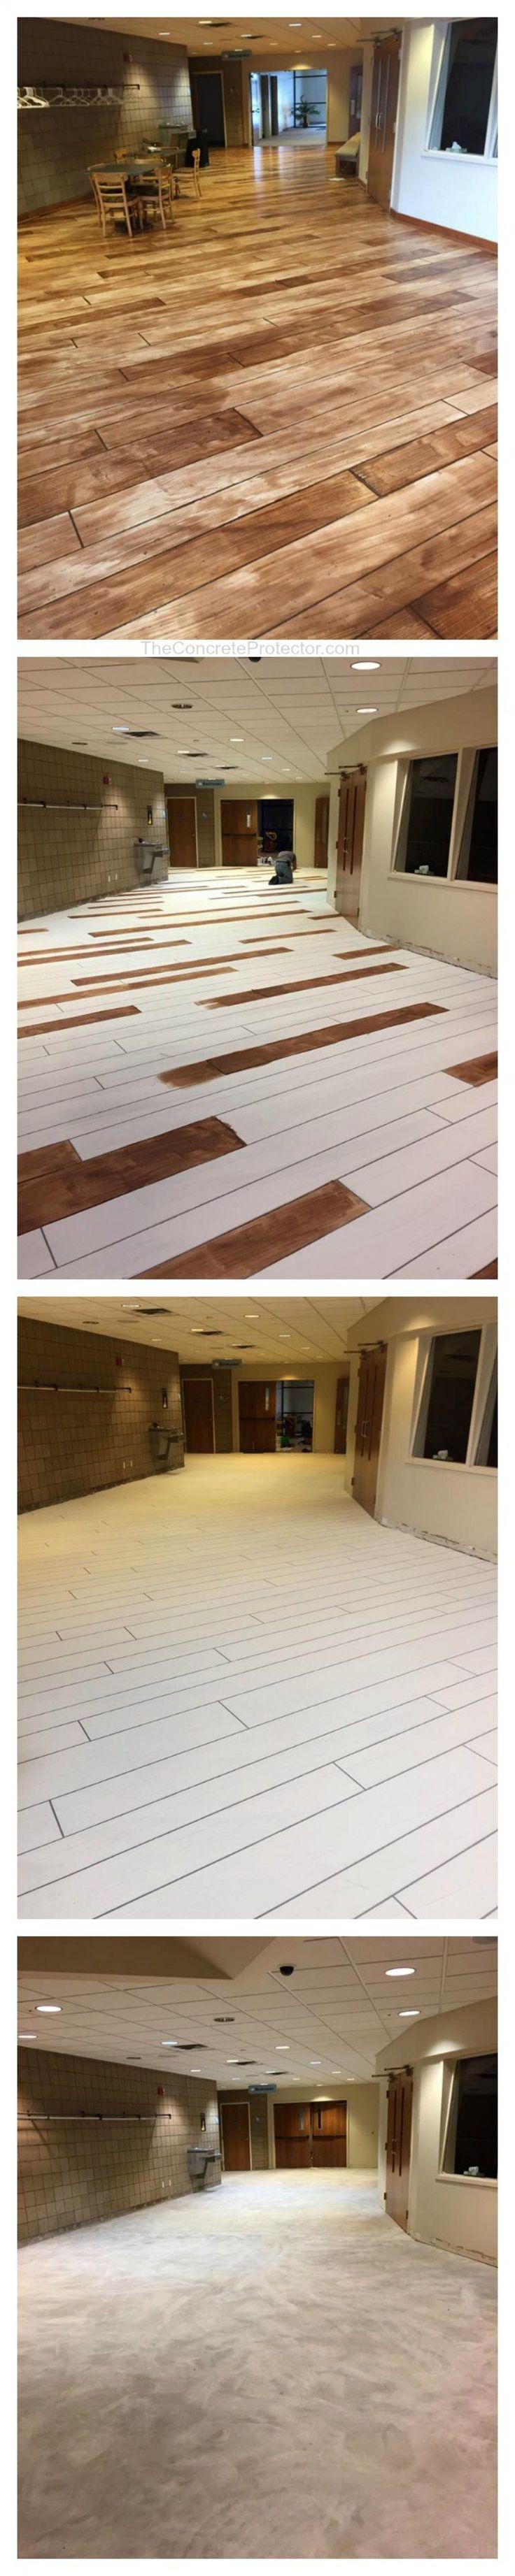 Rapid City/ South Dakota/ Concrete Wood/ Concrete Staining/ Concrete Overlay/ Commercial